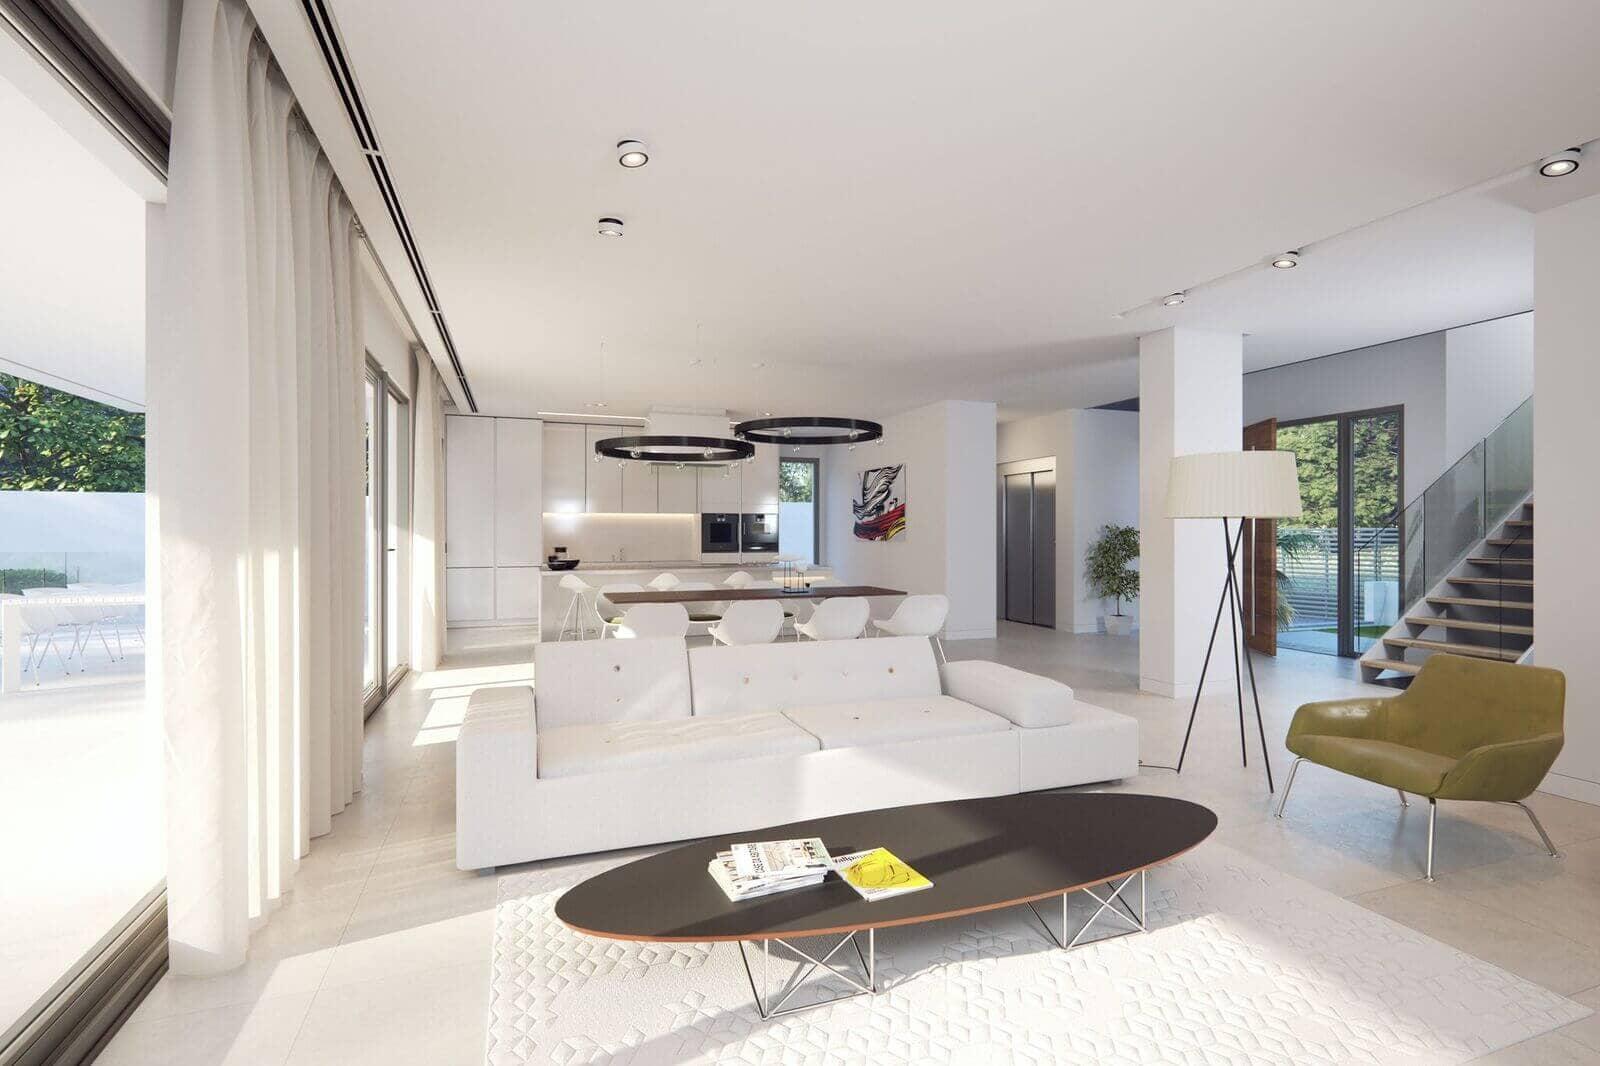 Villas gardenias moderne off plan villas op topligging for Moderne living